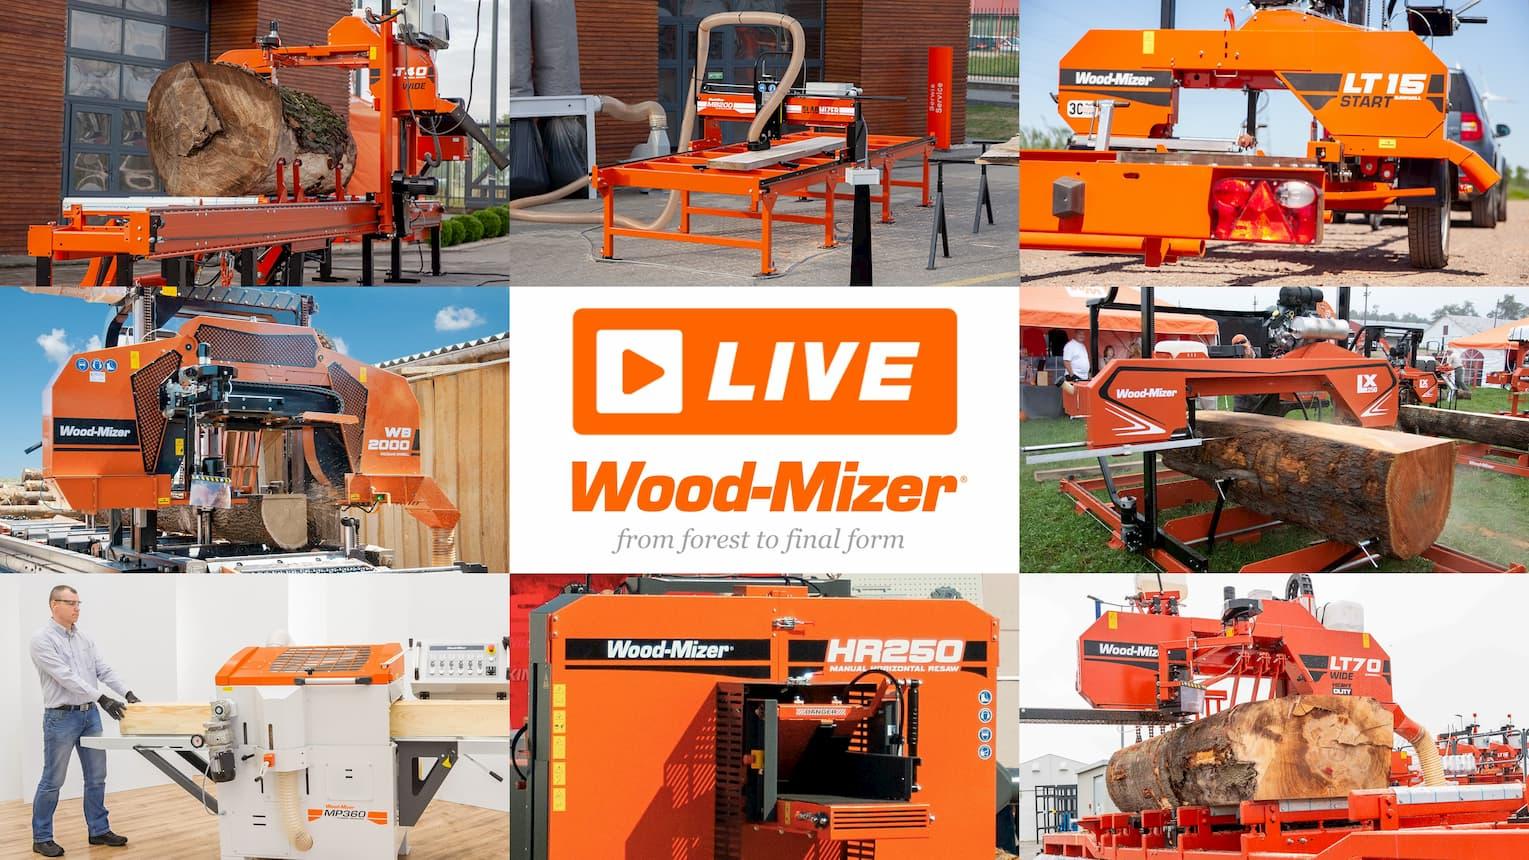 Wood-Mizer LIVE